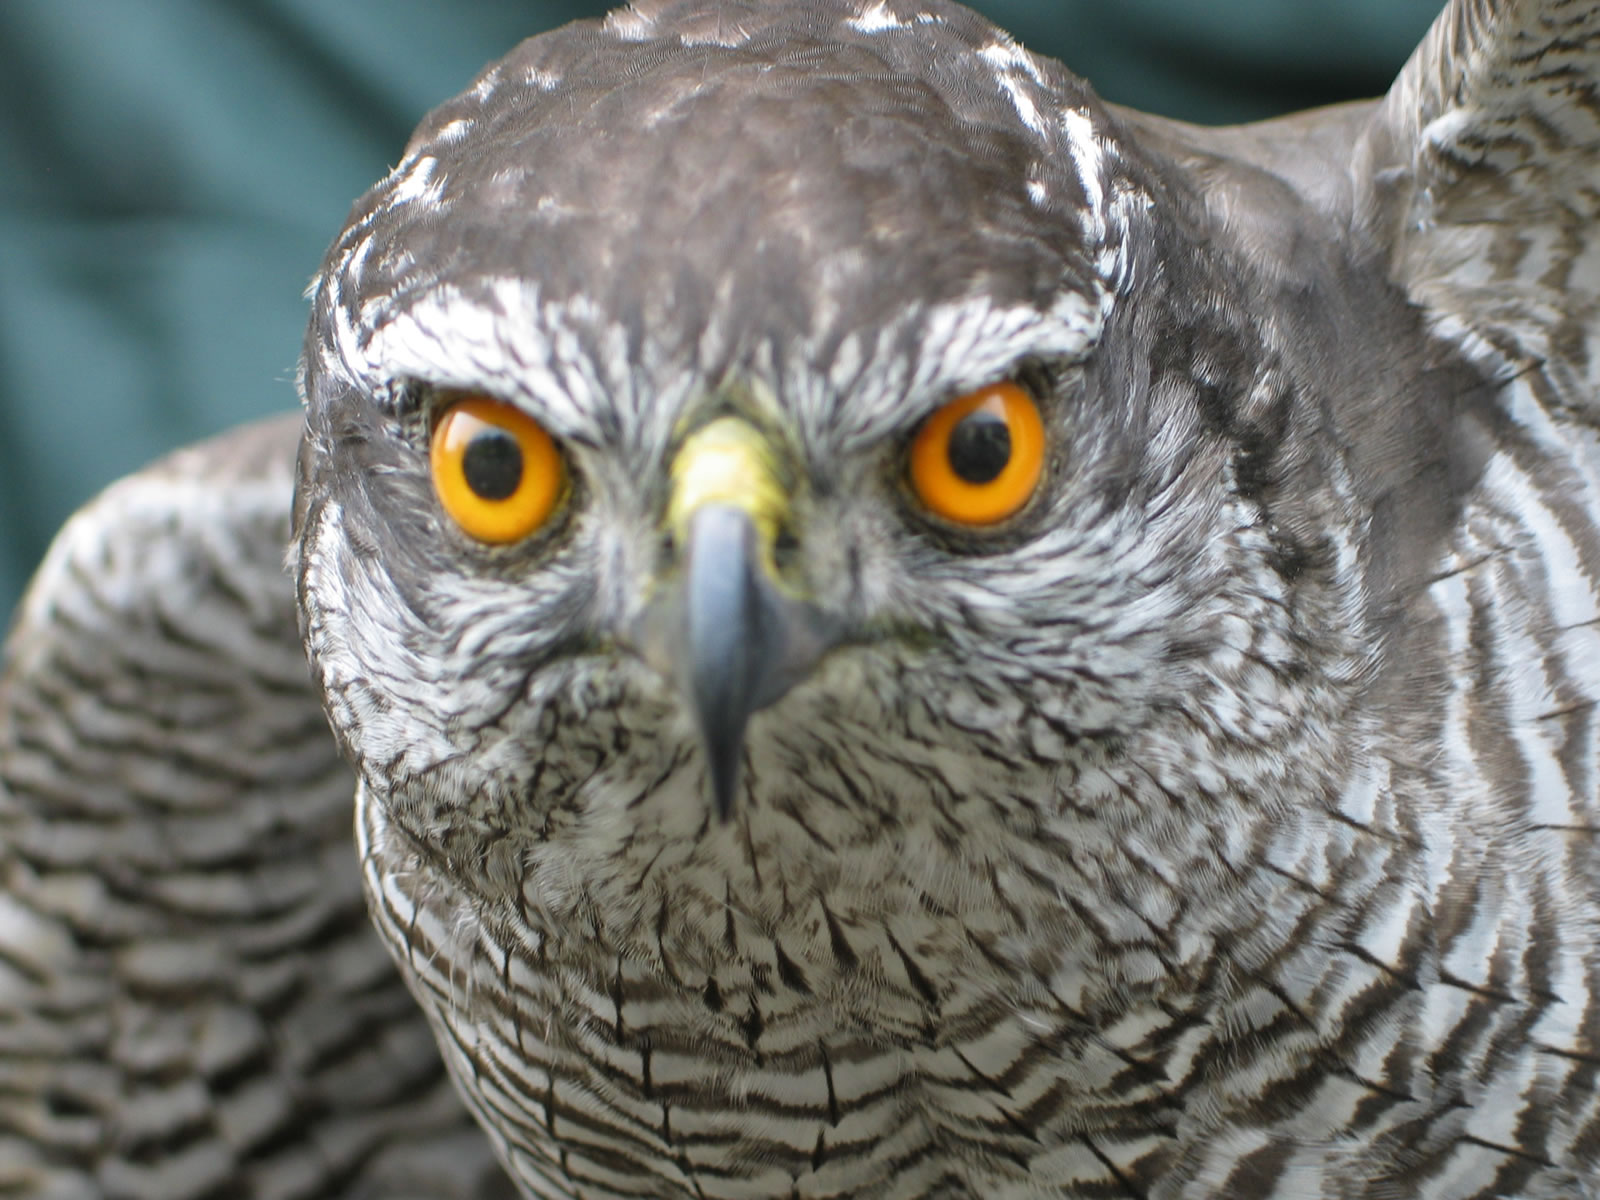 Exotic Birds For Sale >> Goshawk - Updraft - UK Bird Small Mammal Taxidermist Mike Gadd